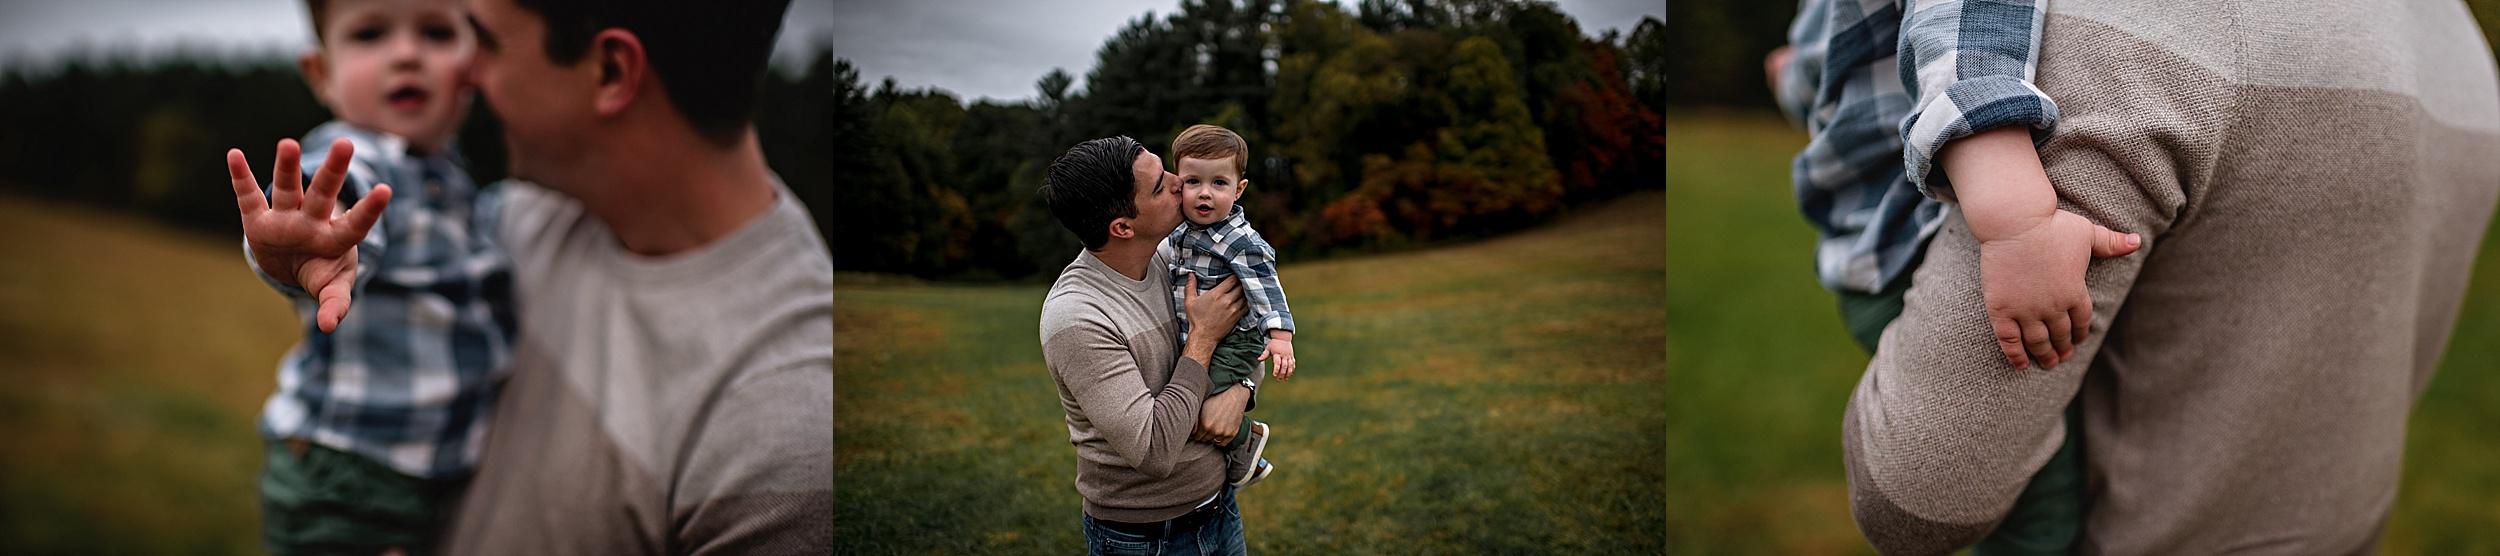 lauren-grayson-photography-portrait-artist-akron-cleveland-ohio-photographer-family-session-fields-sunset-fall_0204.jpg